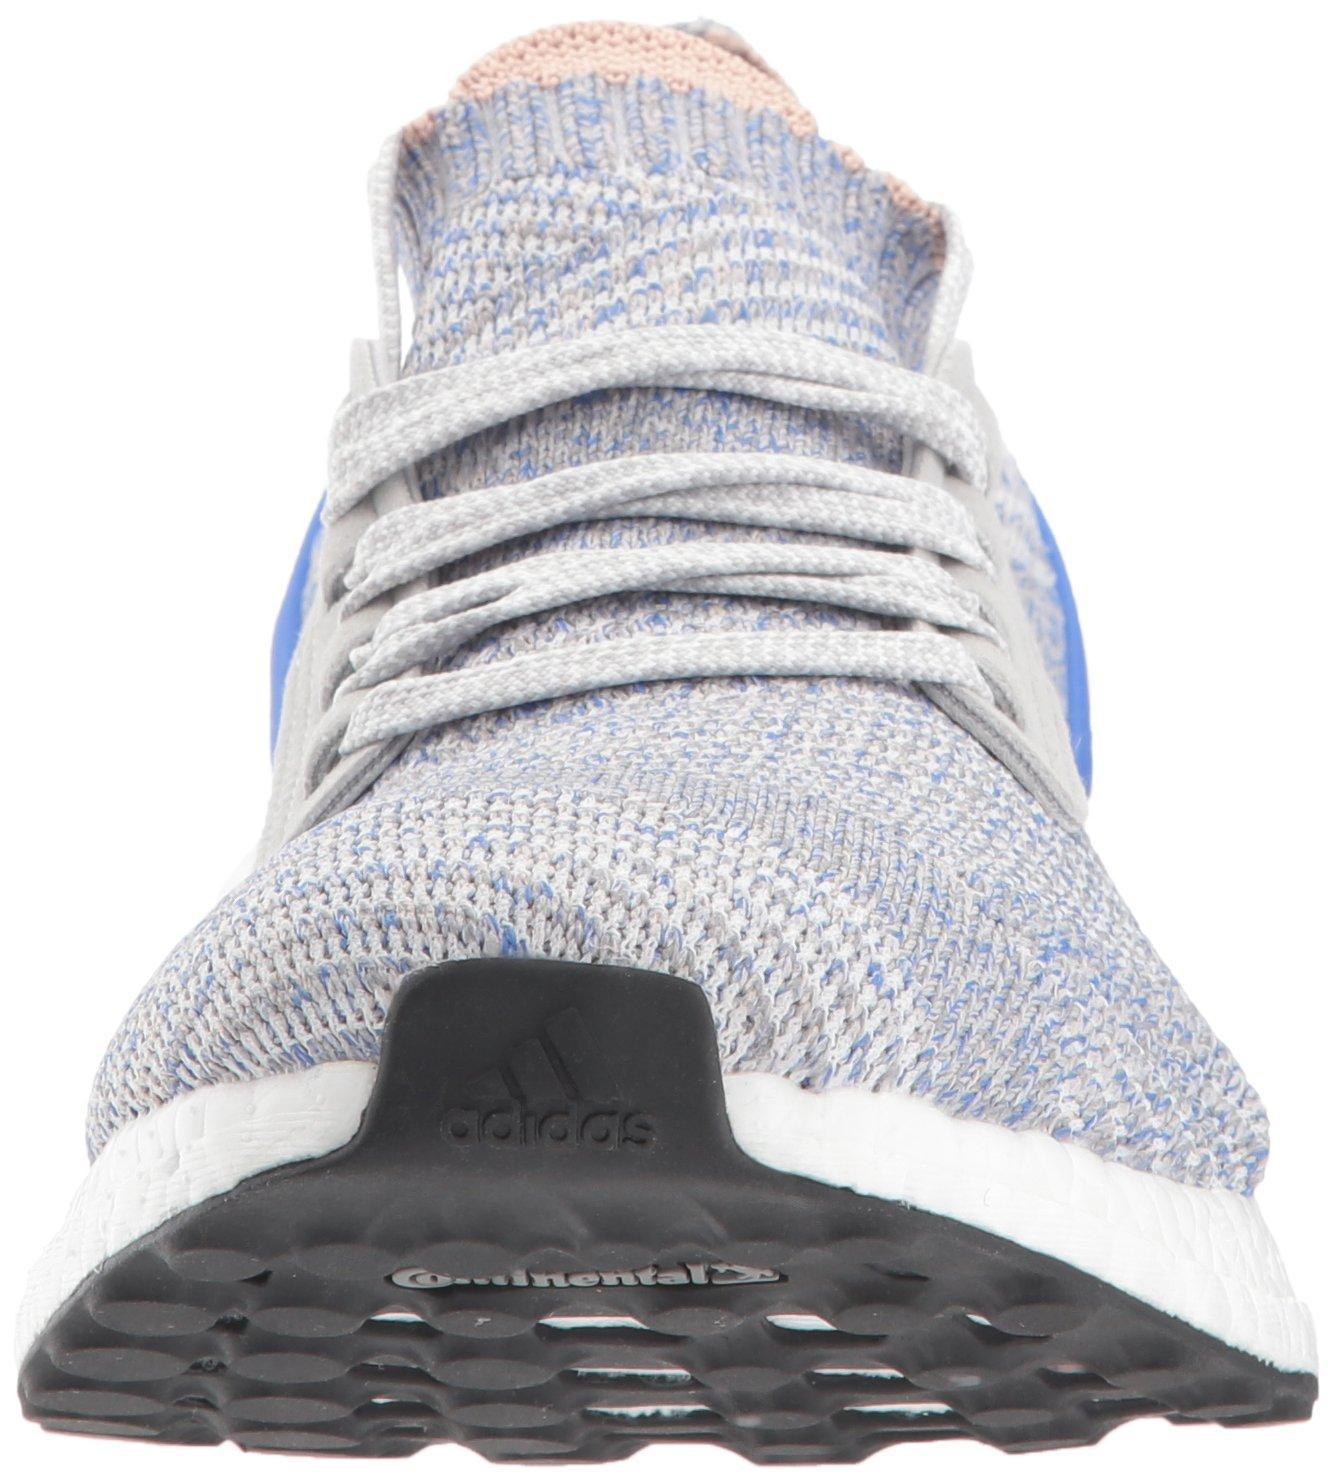 adidas femmes ombre brown / Gris / blanc tubulaires cq2463 8 ebay